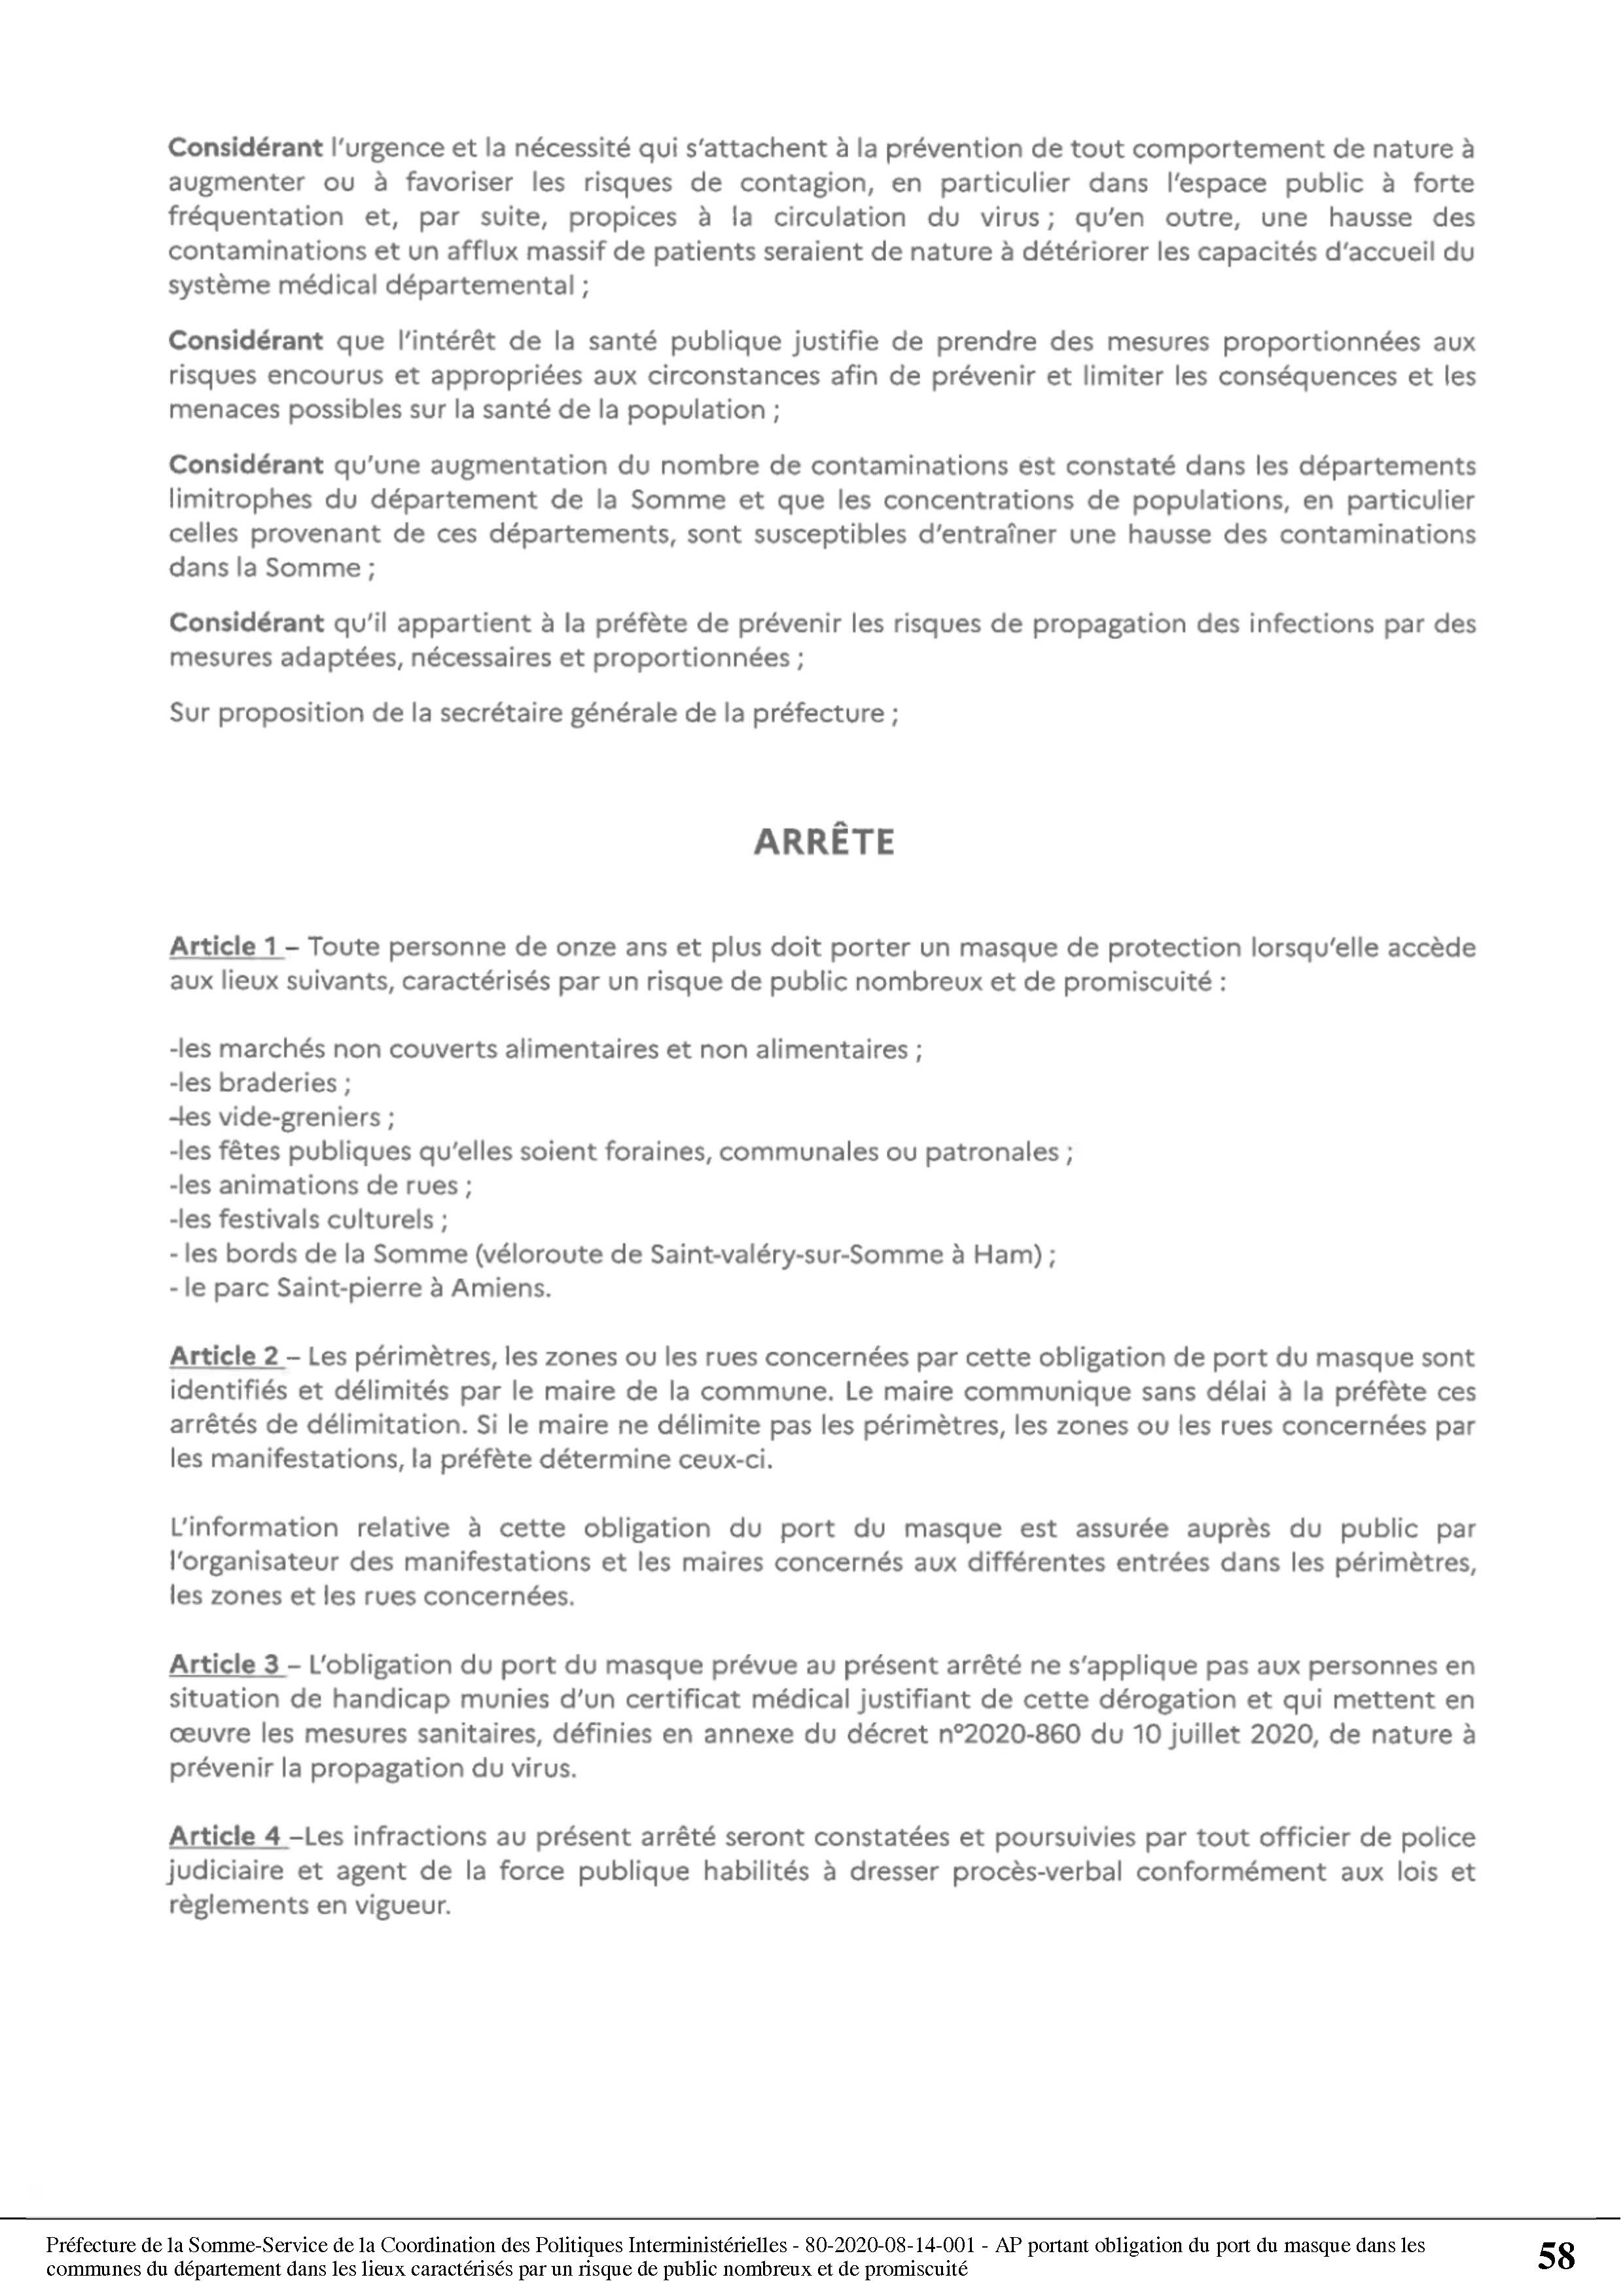 arrete_prefectoral_port_obligatoire_du_masque_page_2.jpg